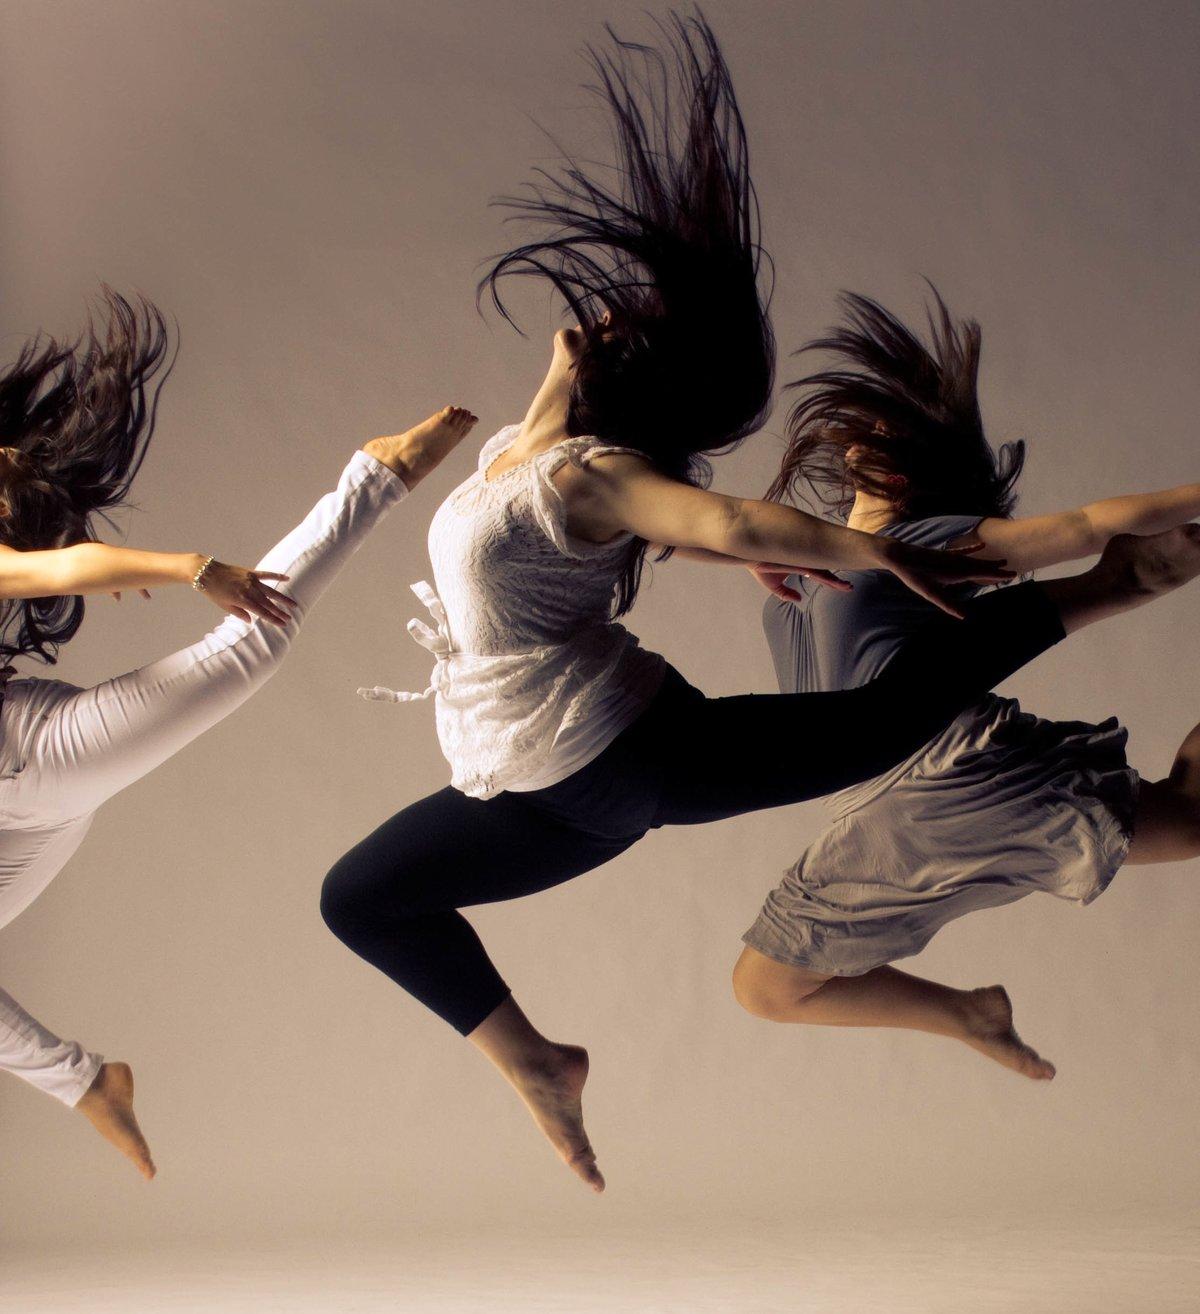 Фото картинки русский народный танец домашних условиях